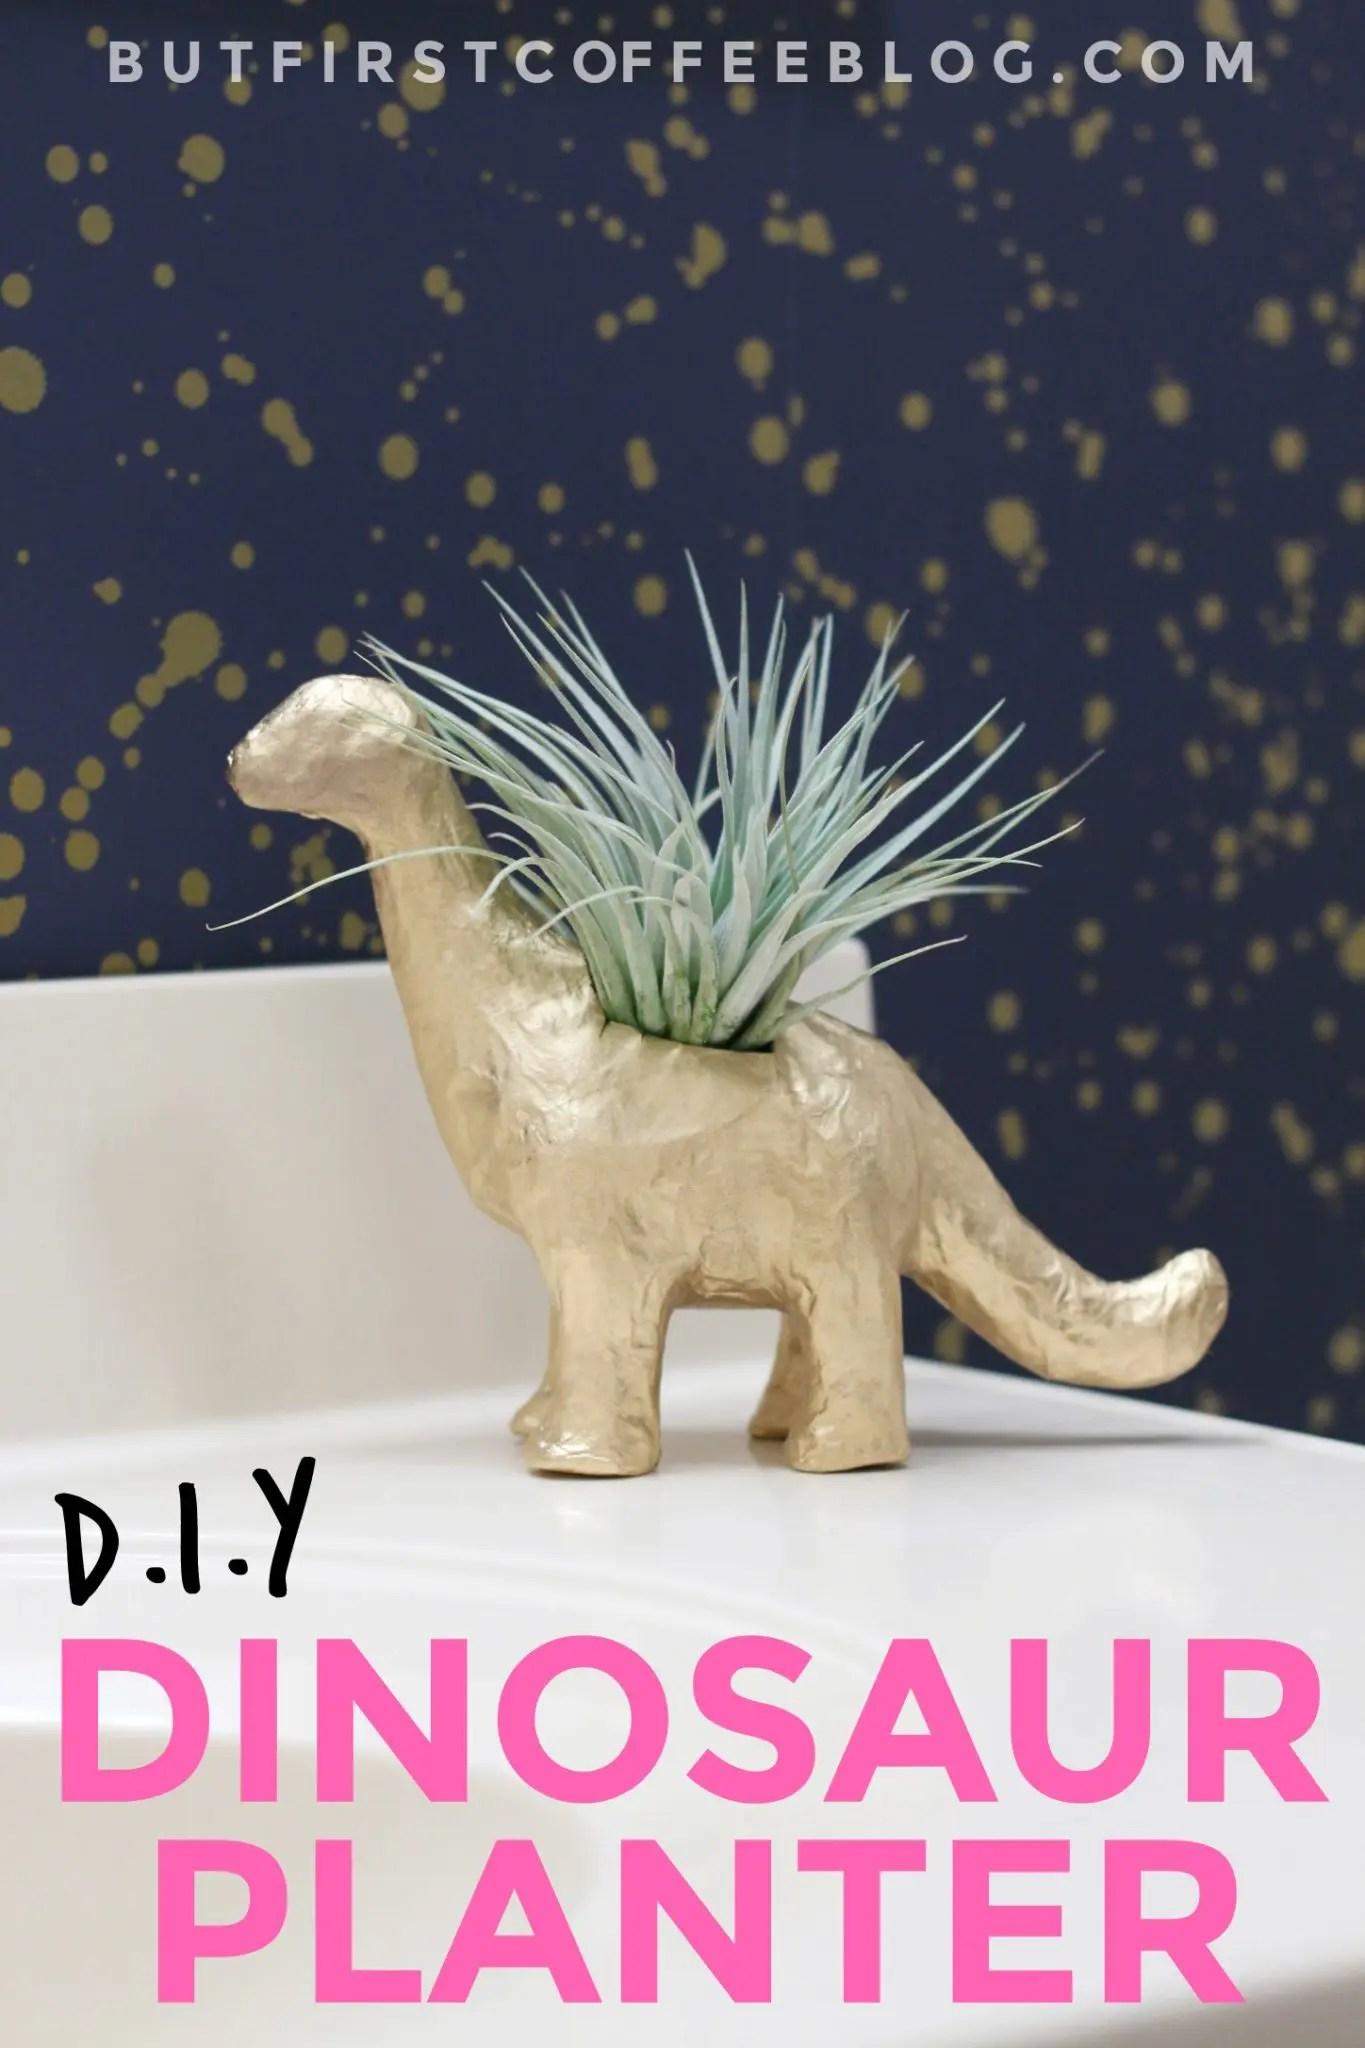 DIY Dinosaur Planter | How to Make an Animal Planter